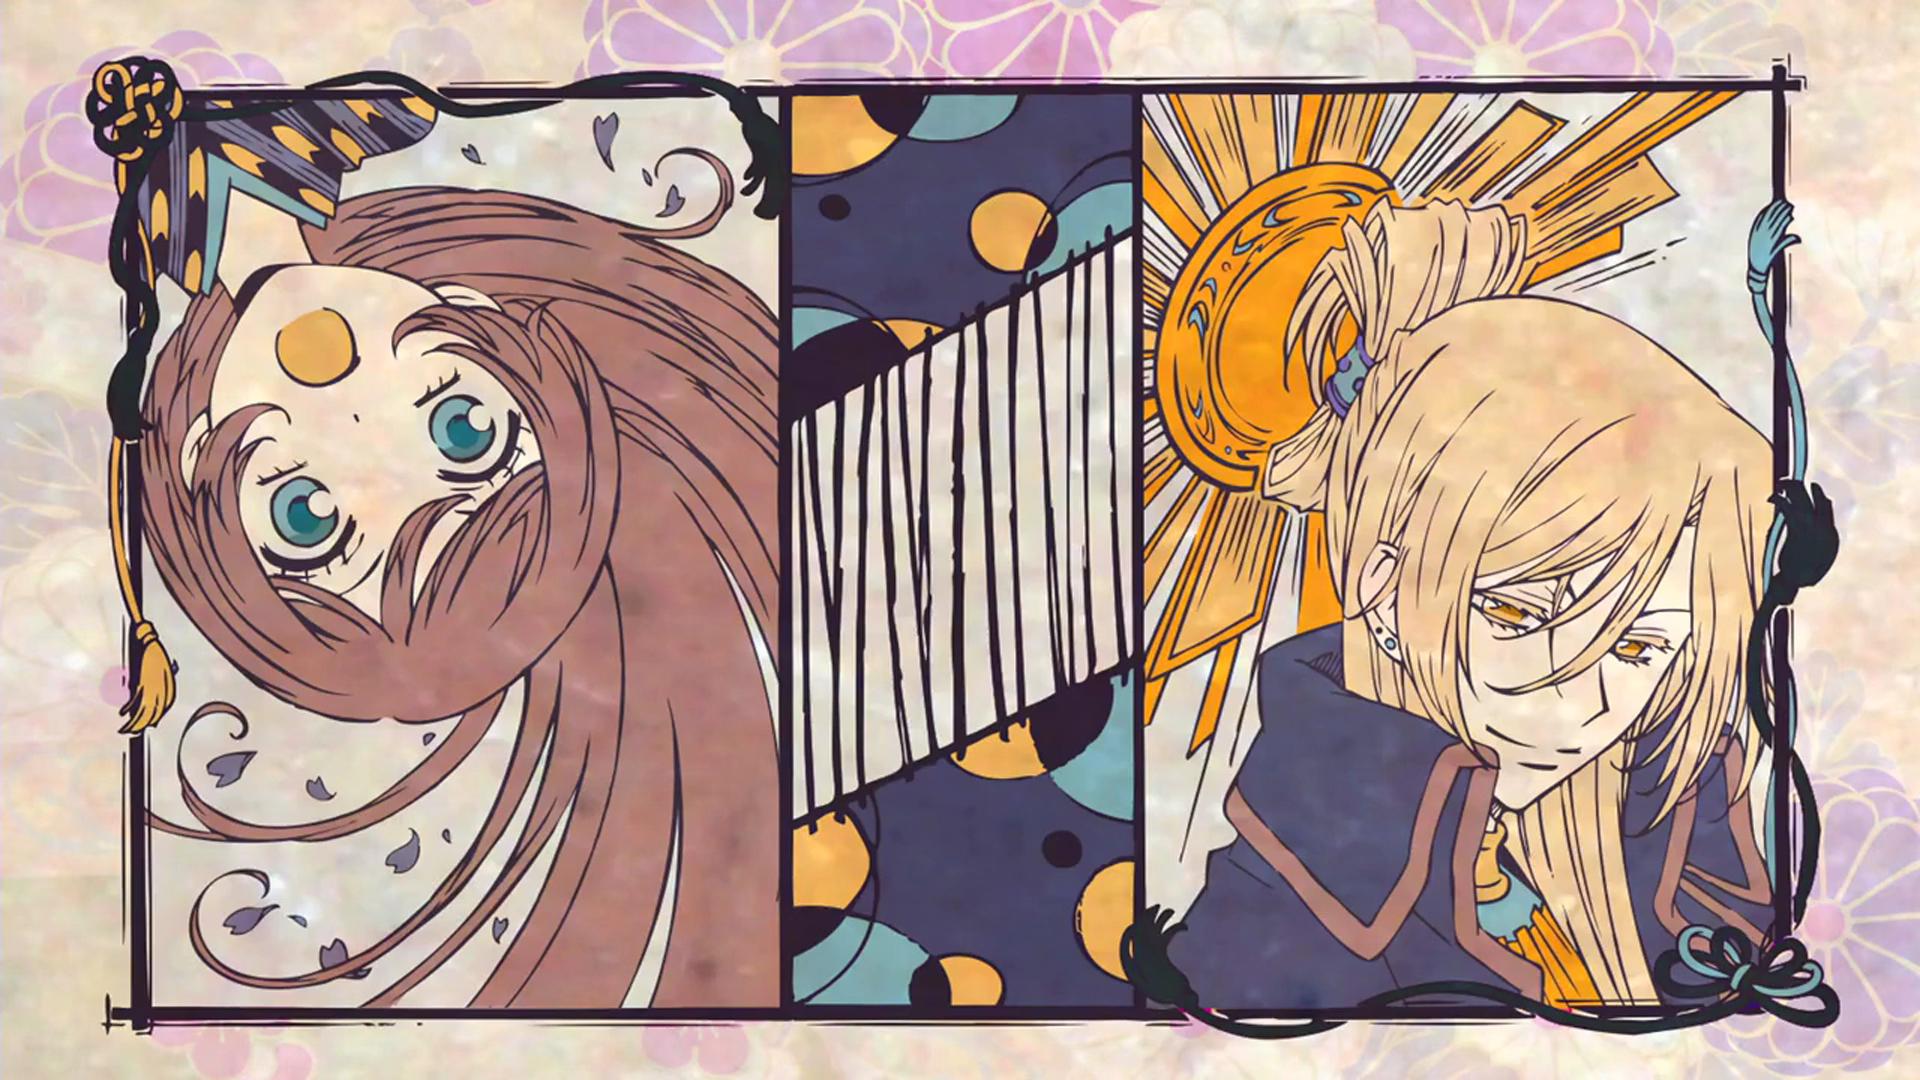 http://orig00.deviantart.net/5165/f/2015/029/a/5/kamisama_hajimemashita_ii__3__nanami___ookuninushi_by_ng9-d8fu1jy.jpg